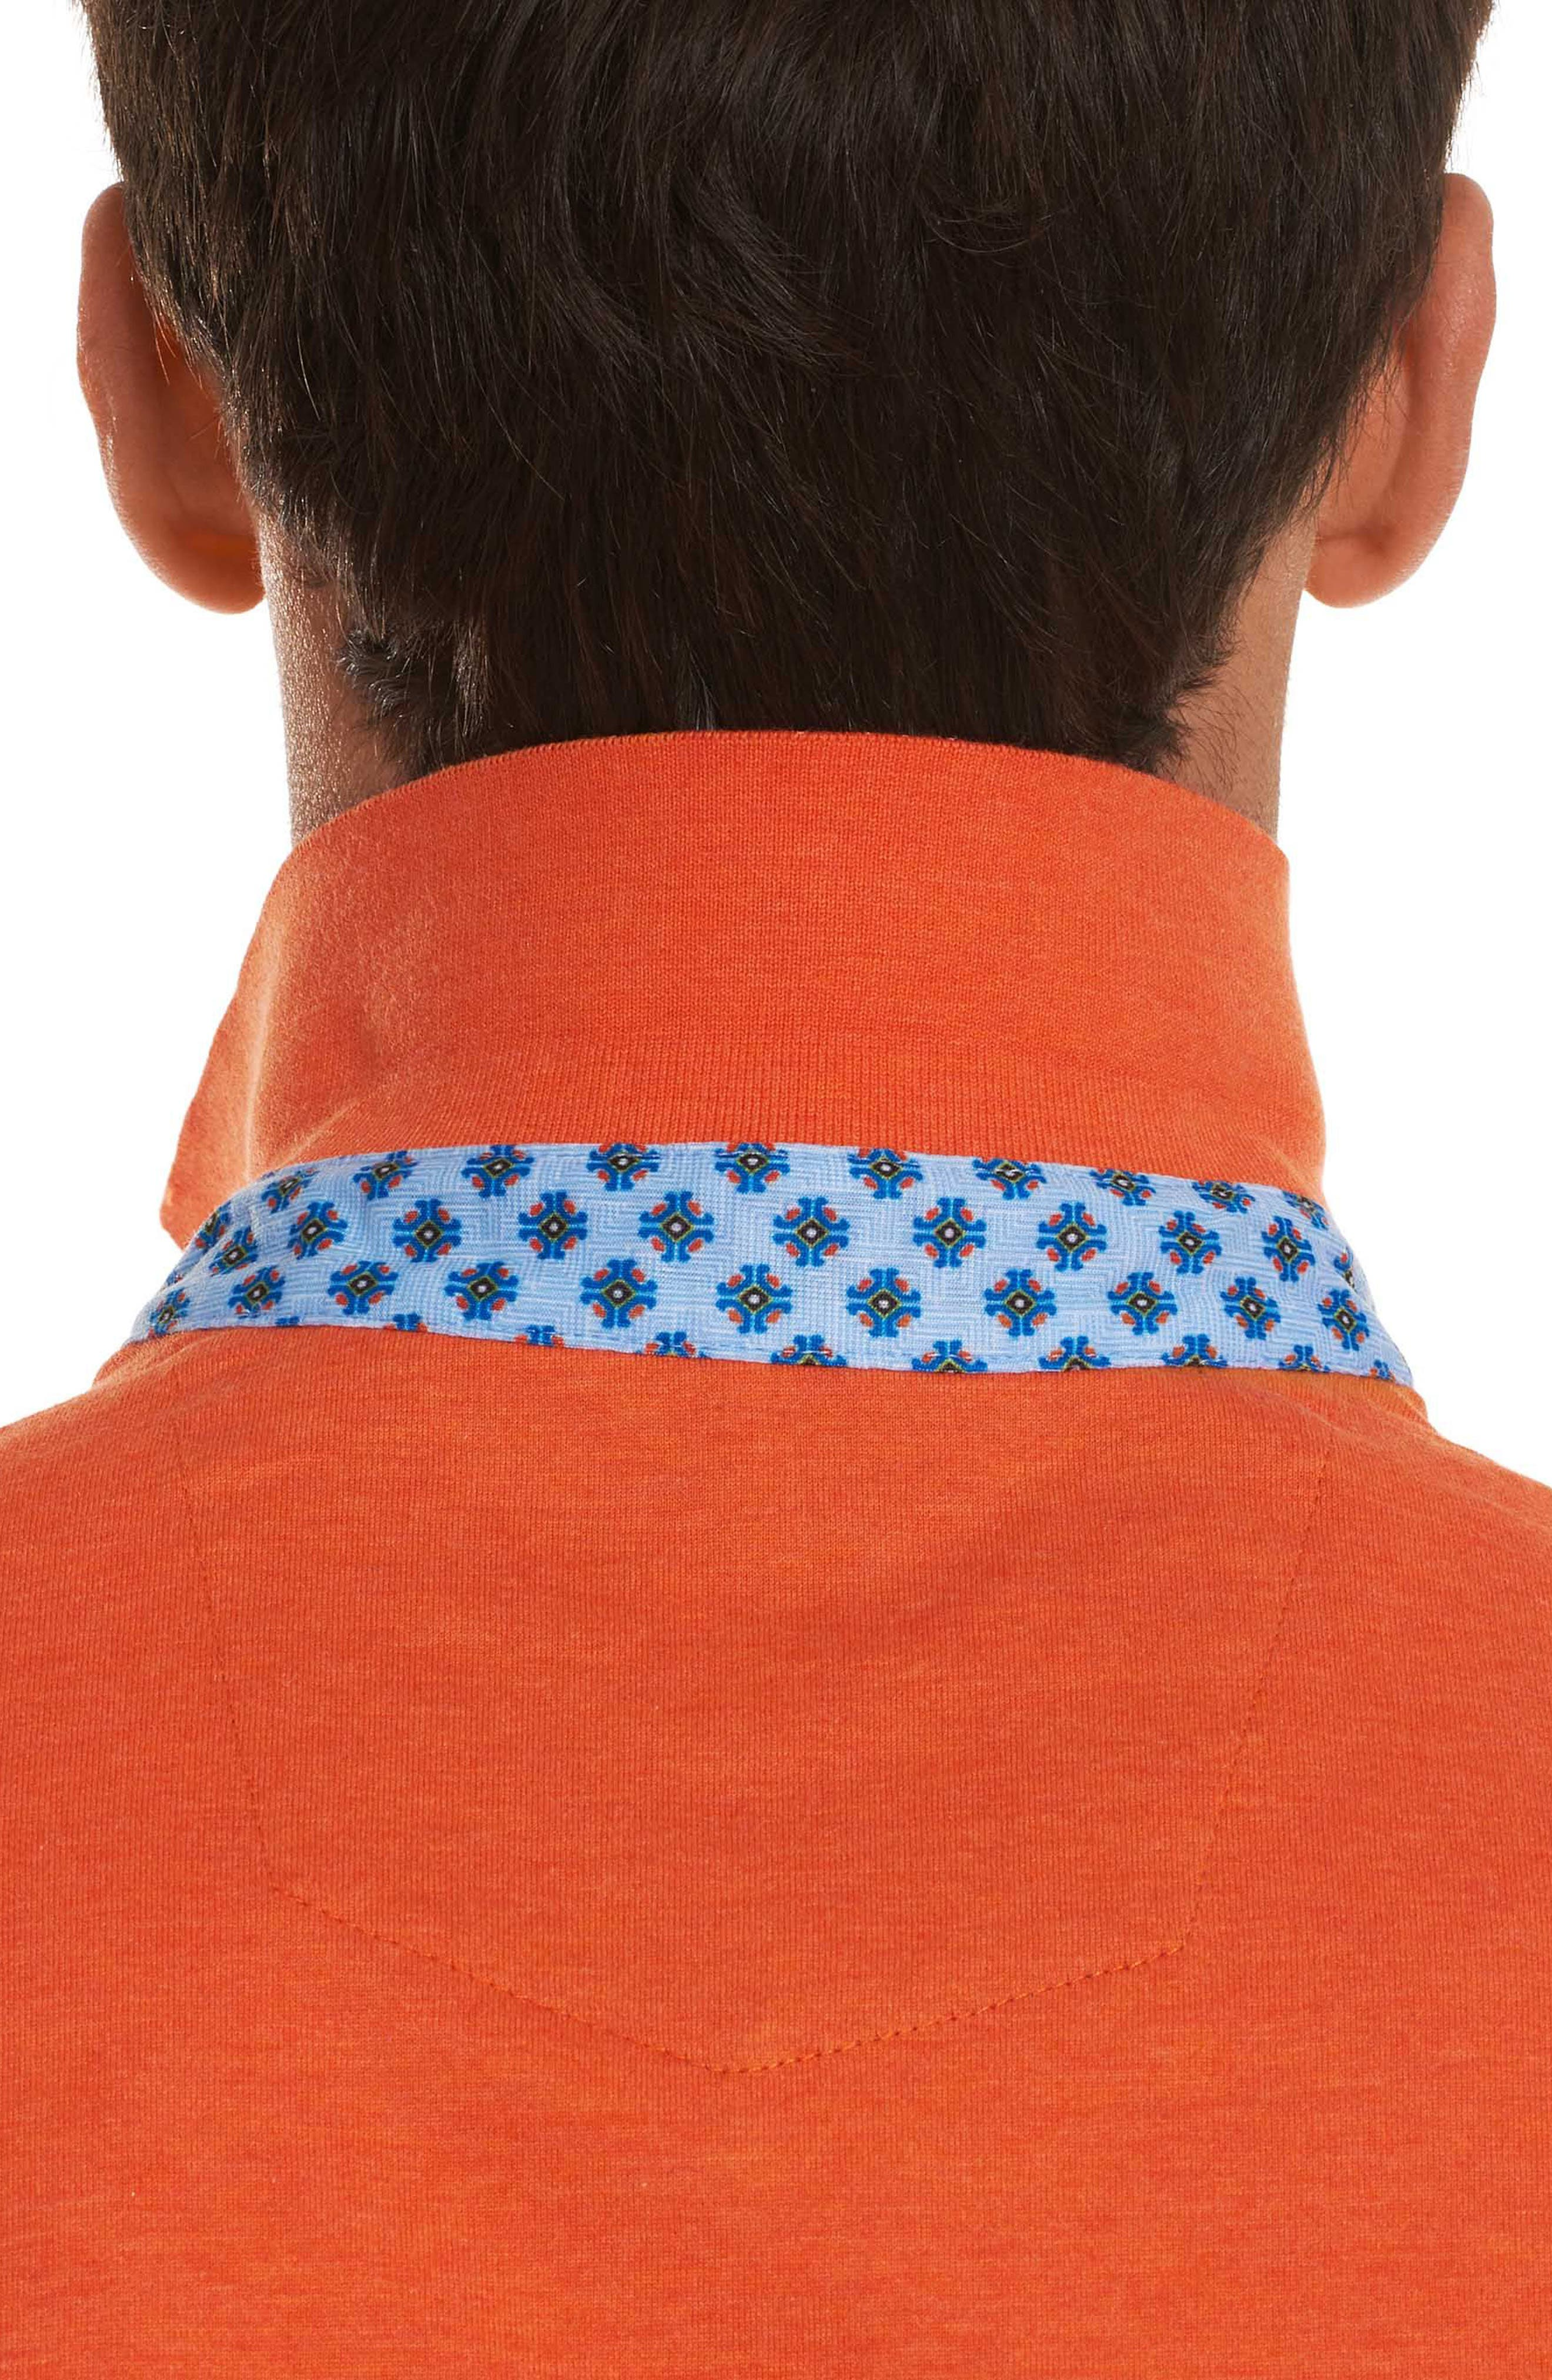 Diego Classic Fit Polo,                             Alternate thumbnail 3, color,                             Orange